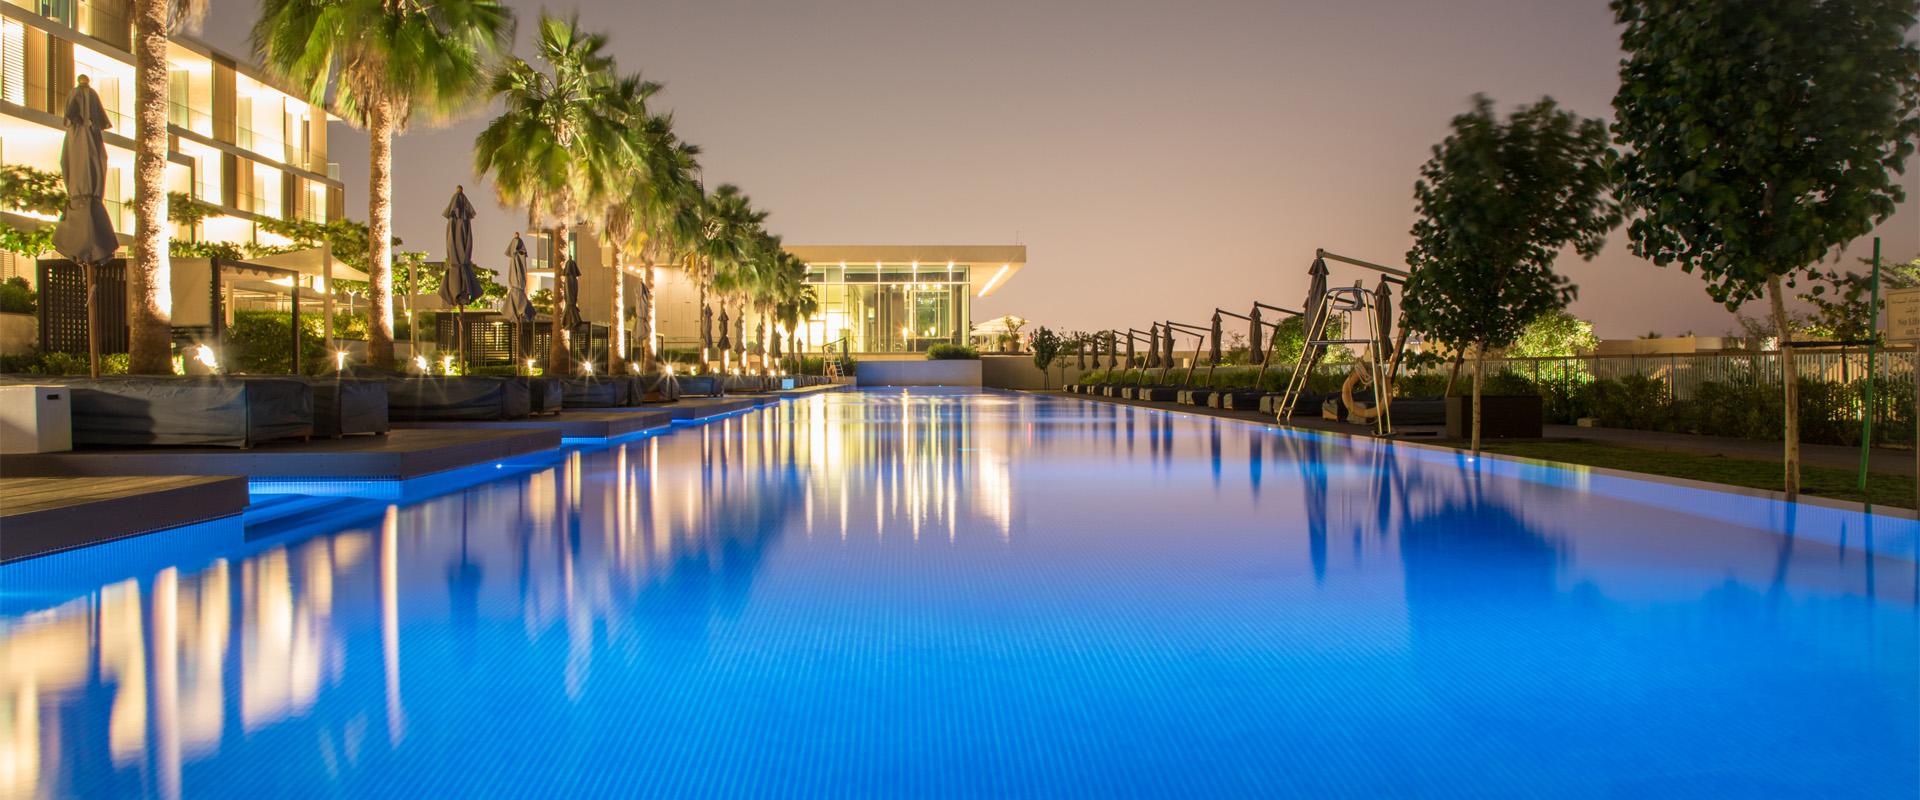 al-zohra-resort-pool-by-desert-leisure